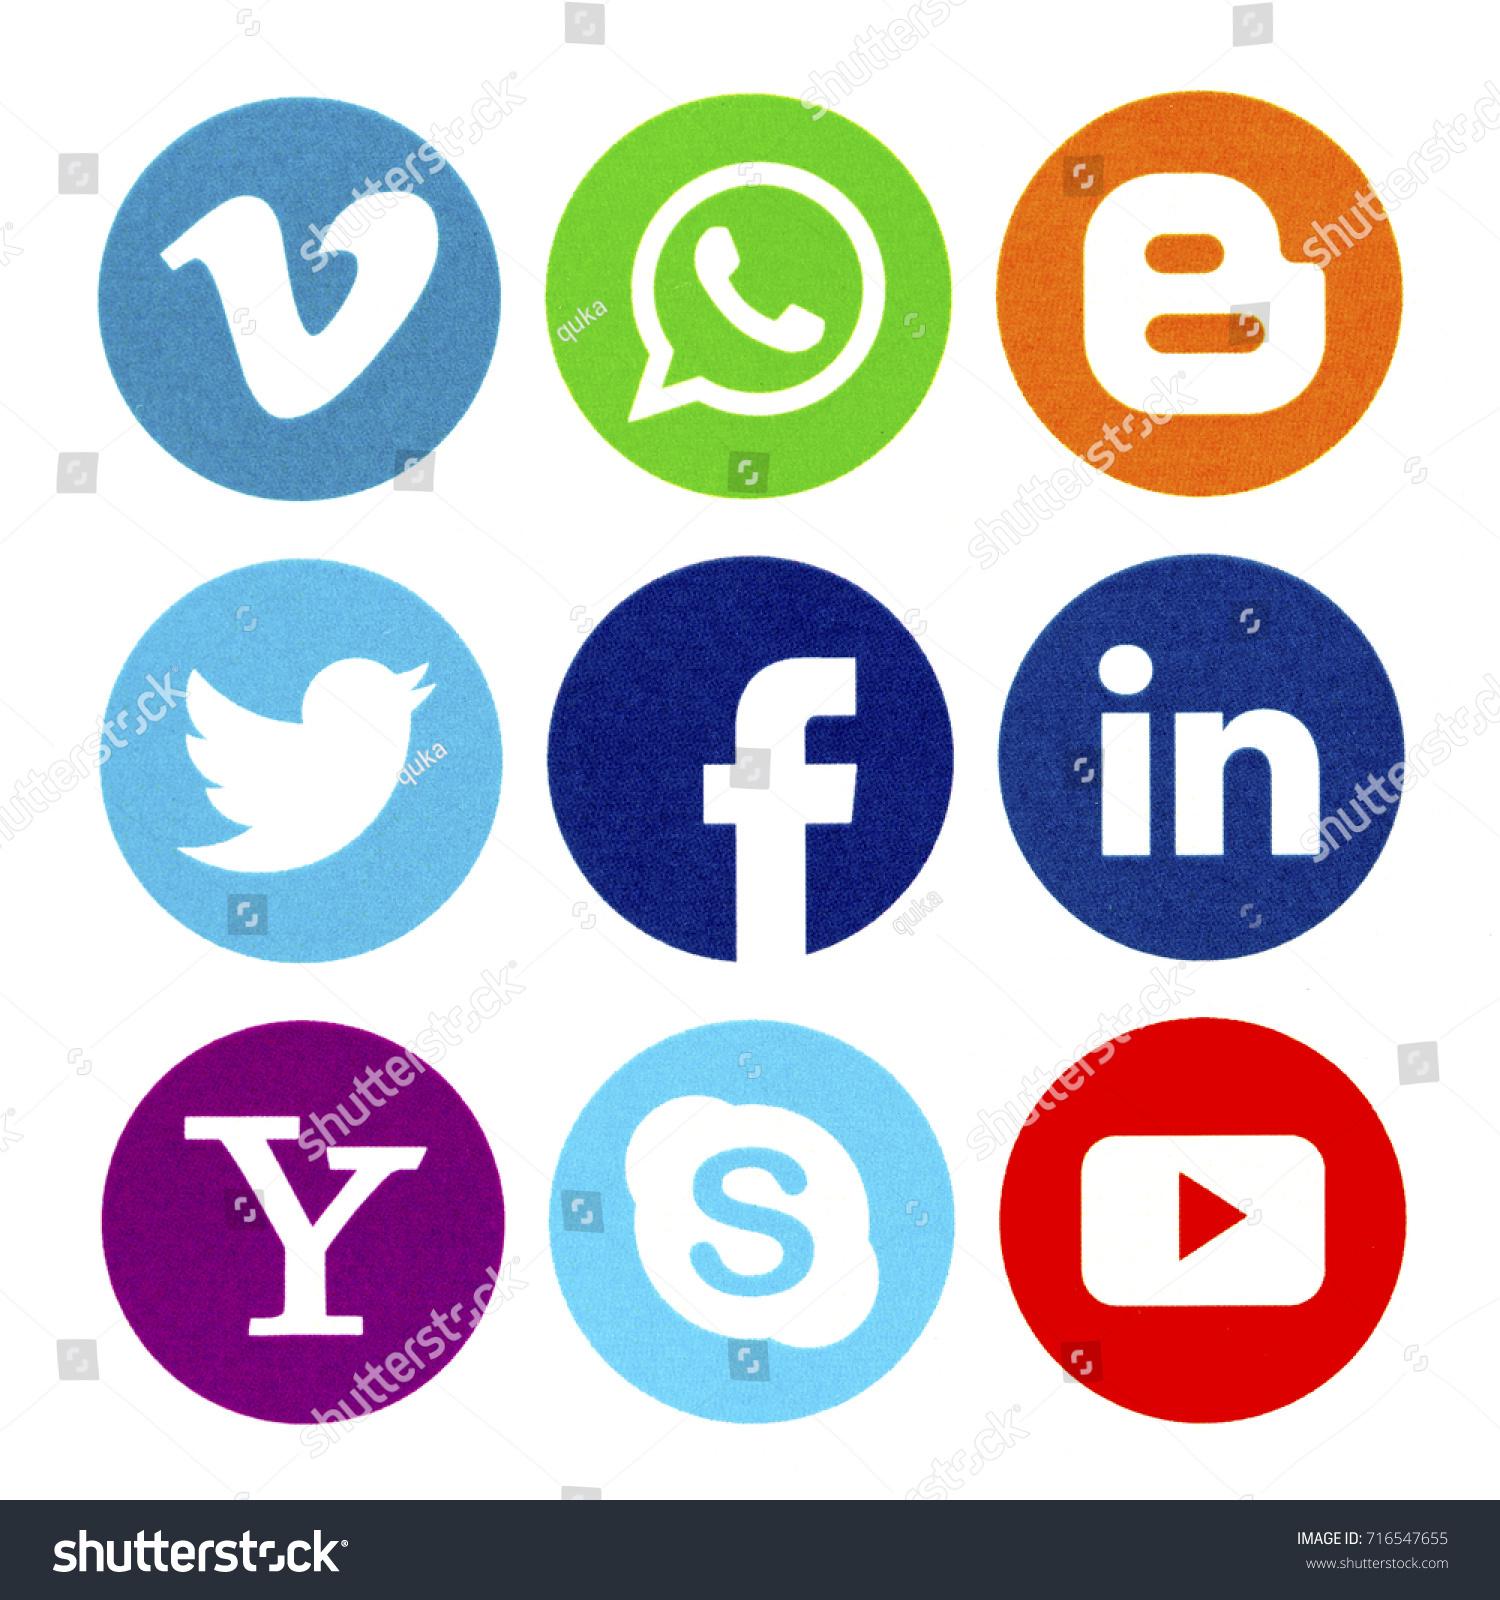 Belgrade september 17 2017 set popular stock photo 716547655 belgrade september 17 2017 set of popular social media icons printed on white buycottarizona